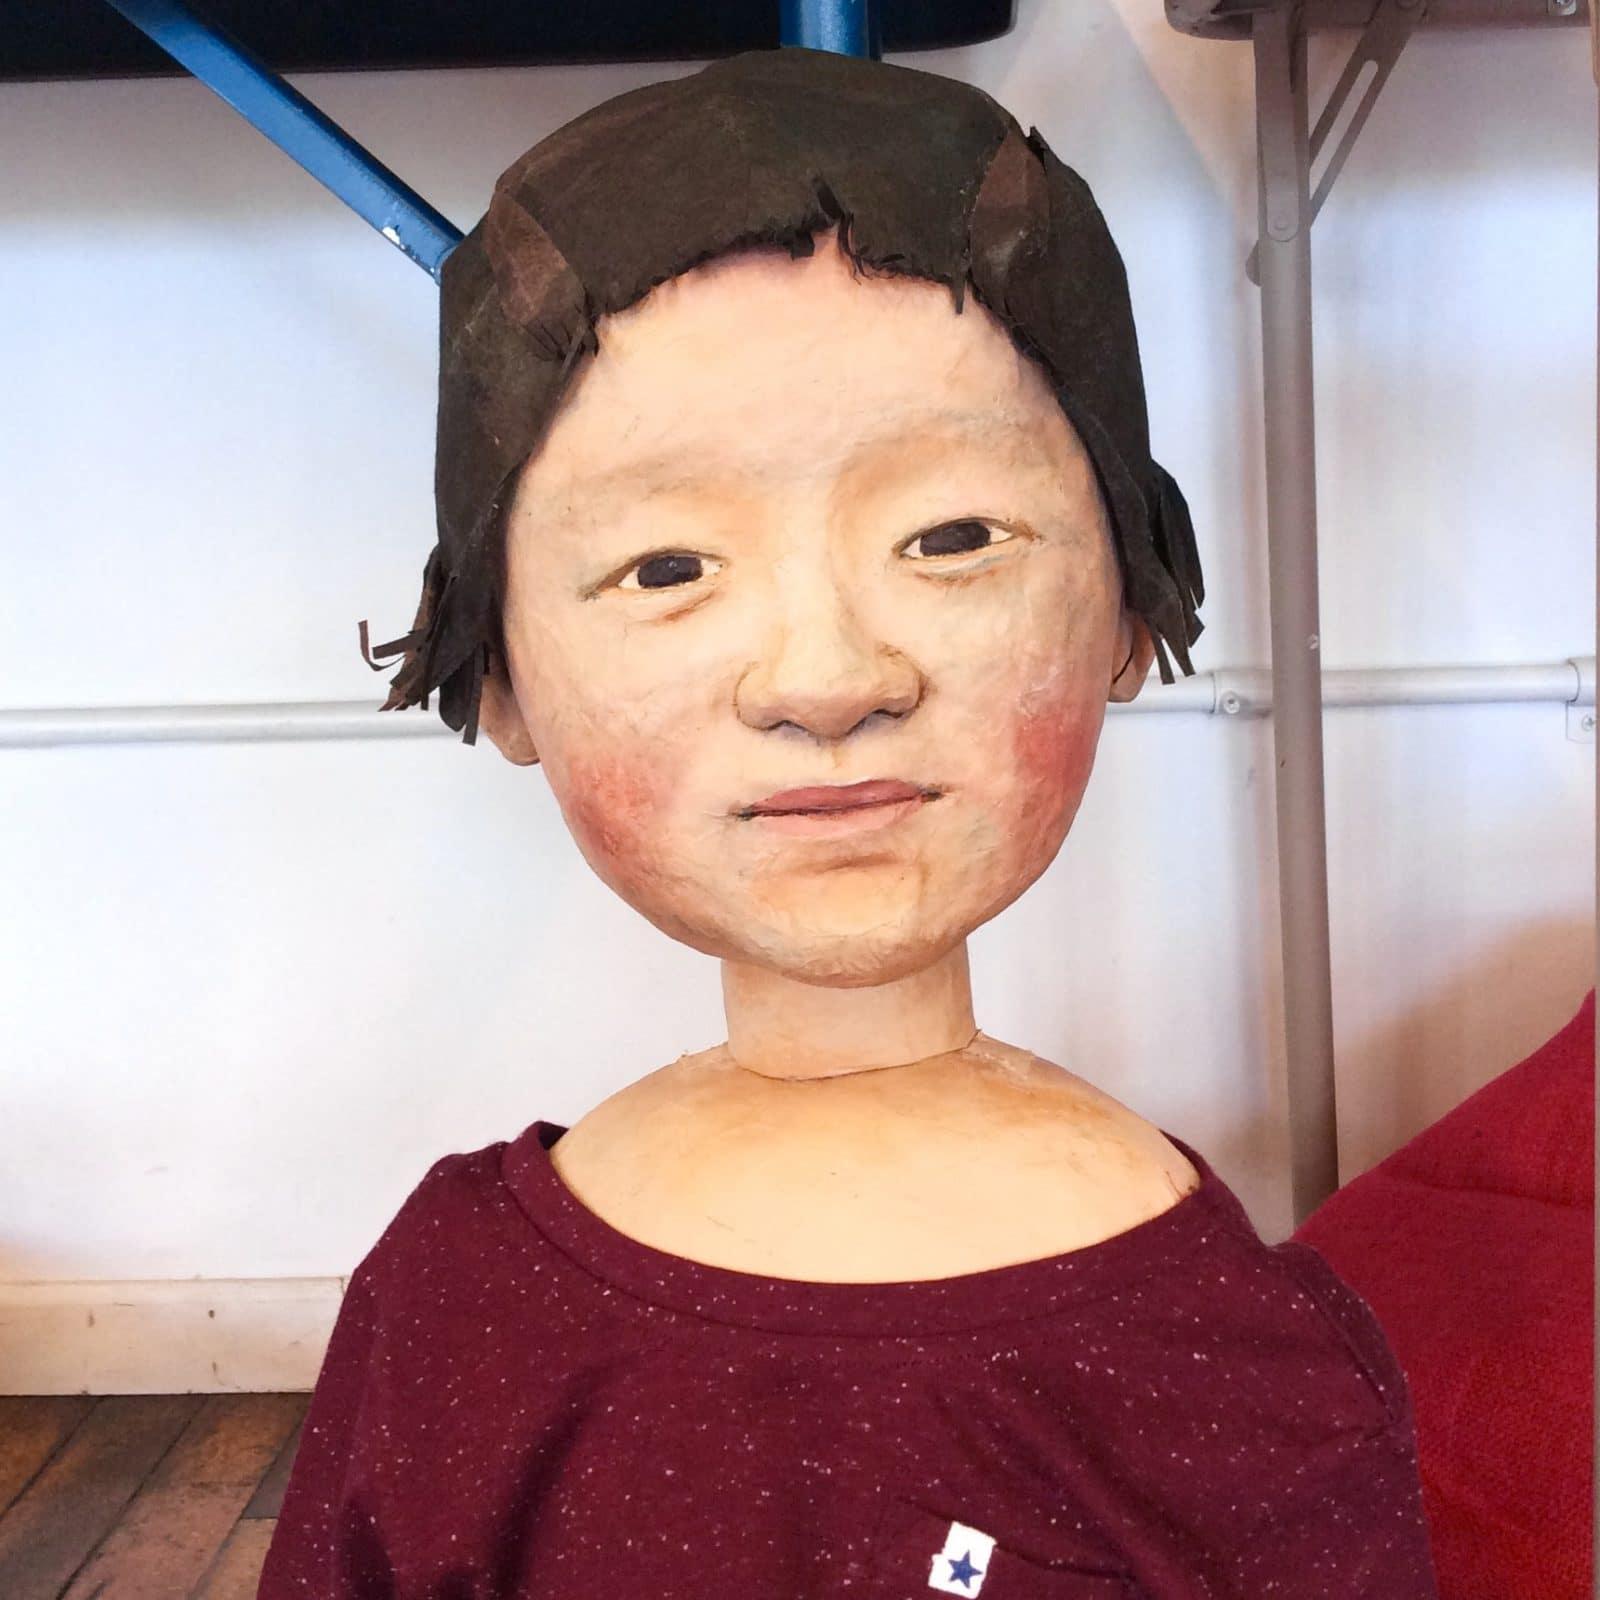 The oldest boy puppet designed and created by Masanari Kawahara